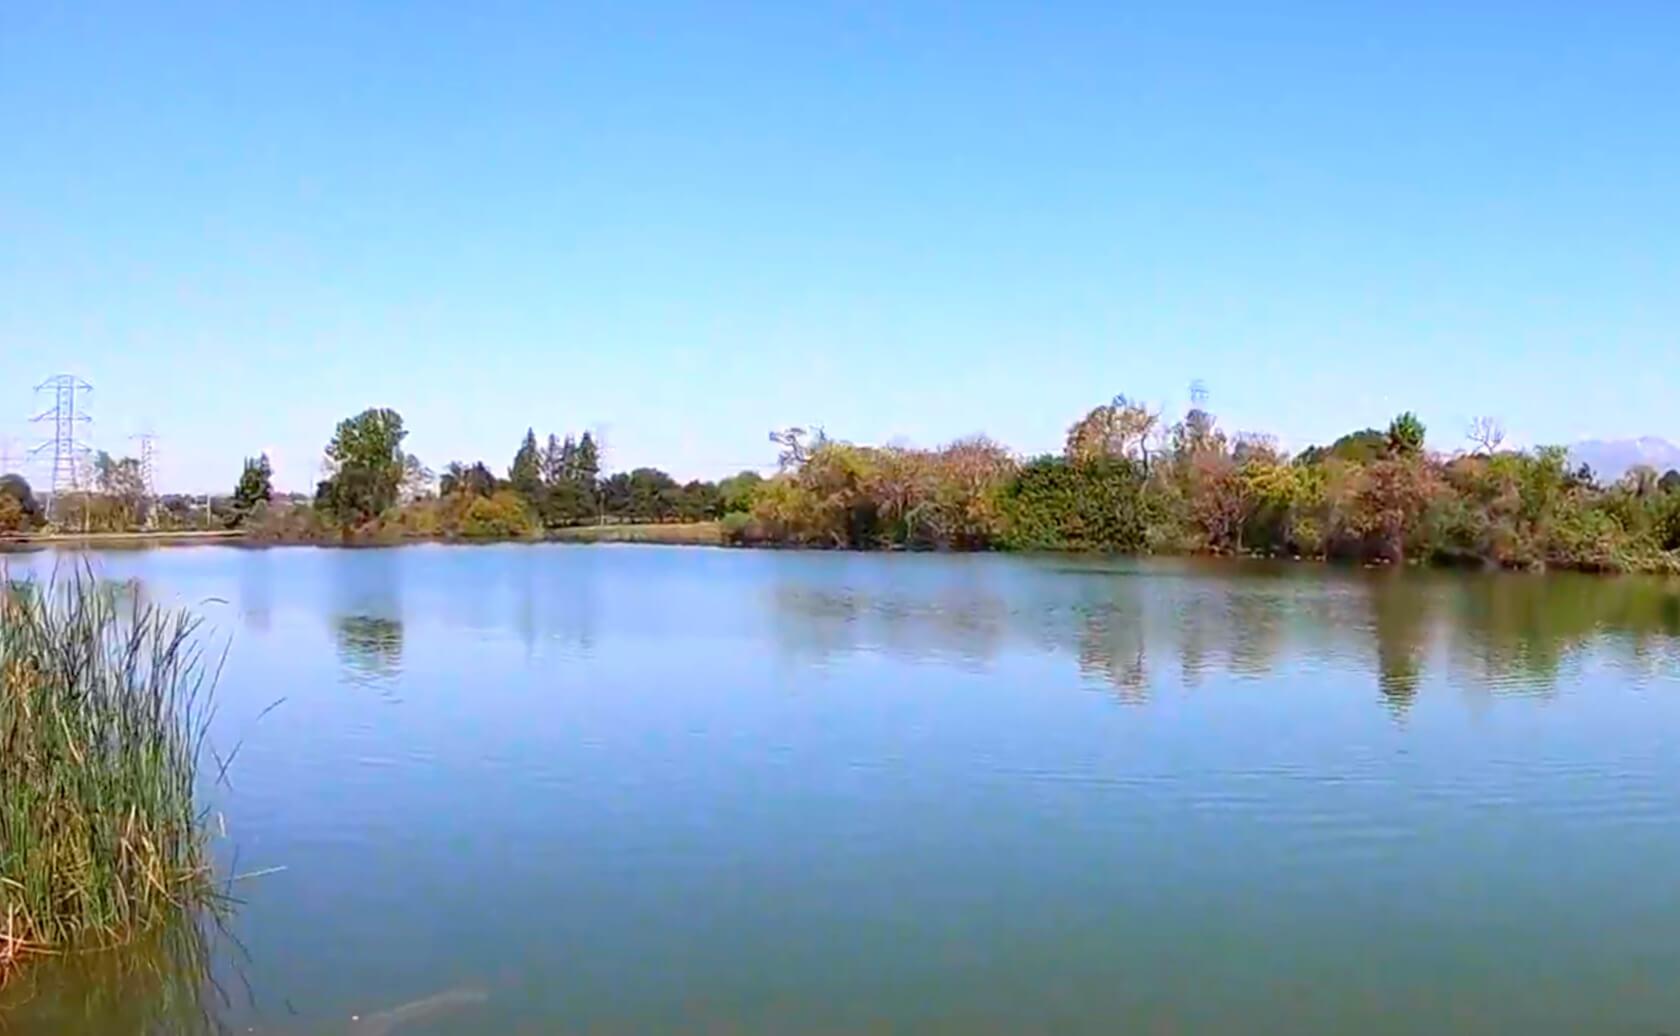 Legg-Lake-Fishing-Guide-Report-South-El-Monte-CA-91733-05